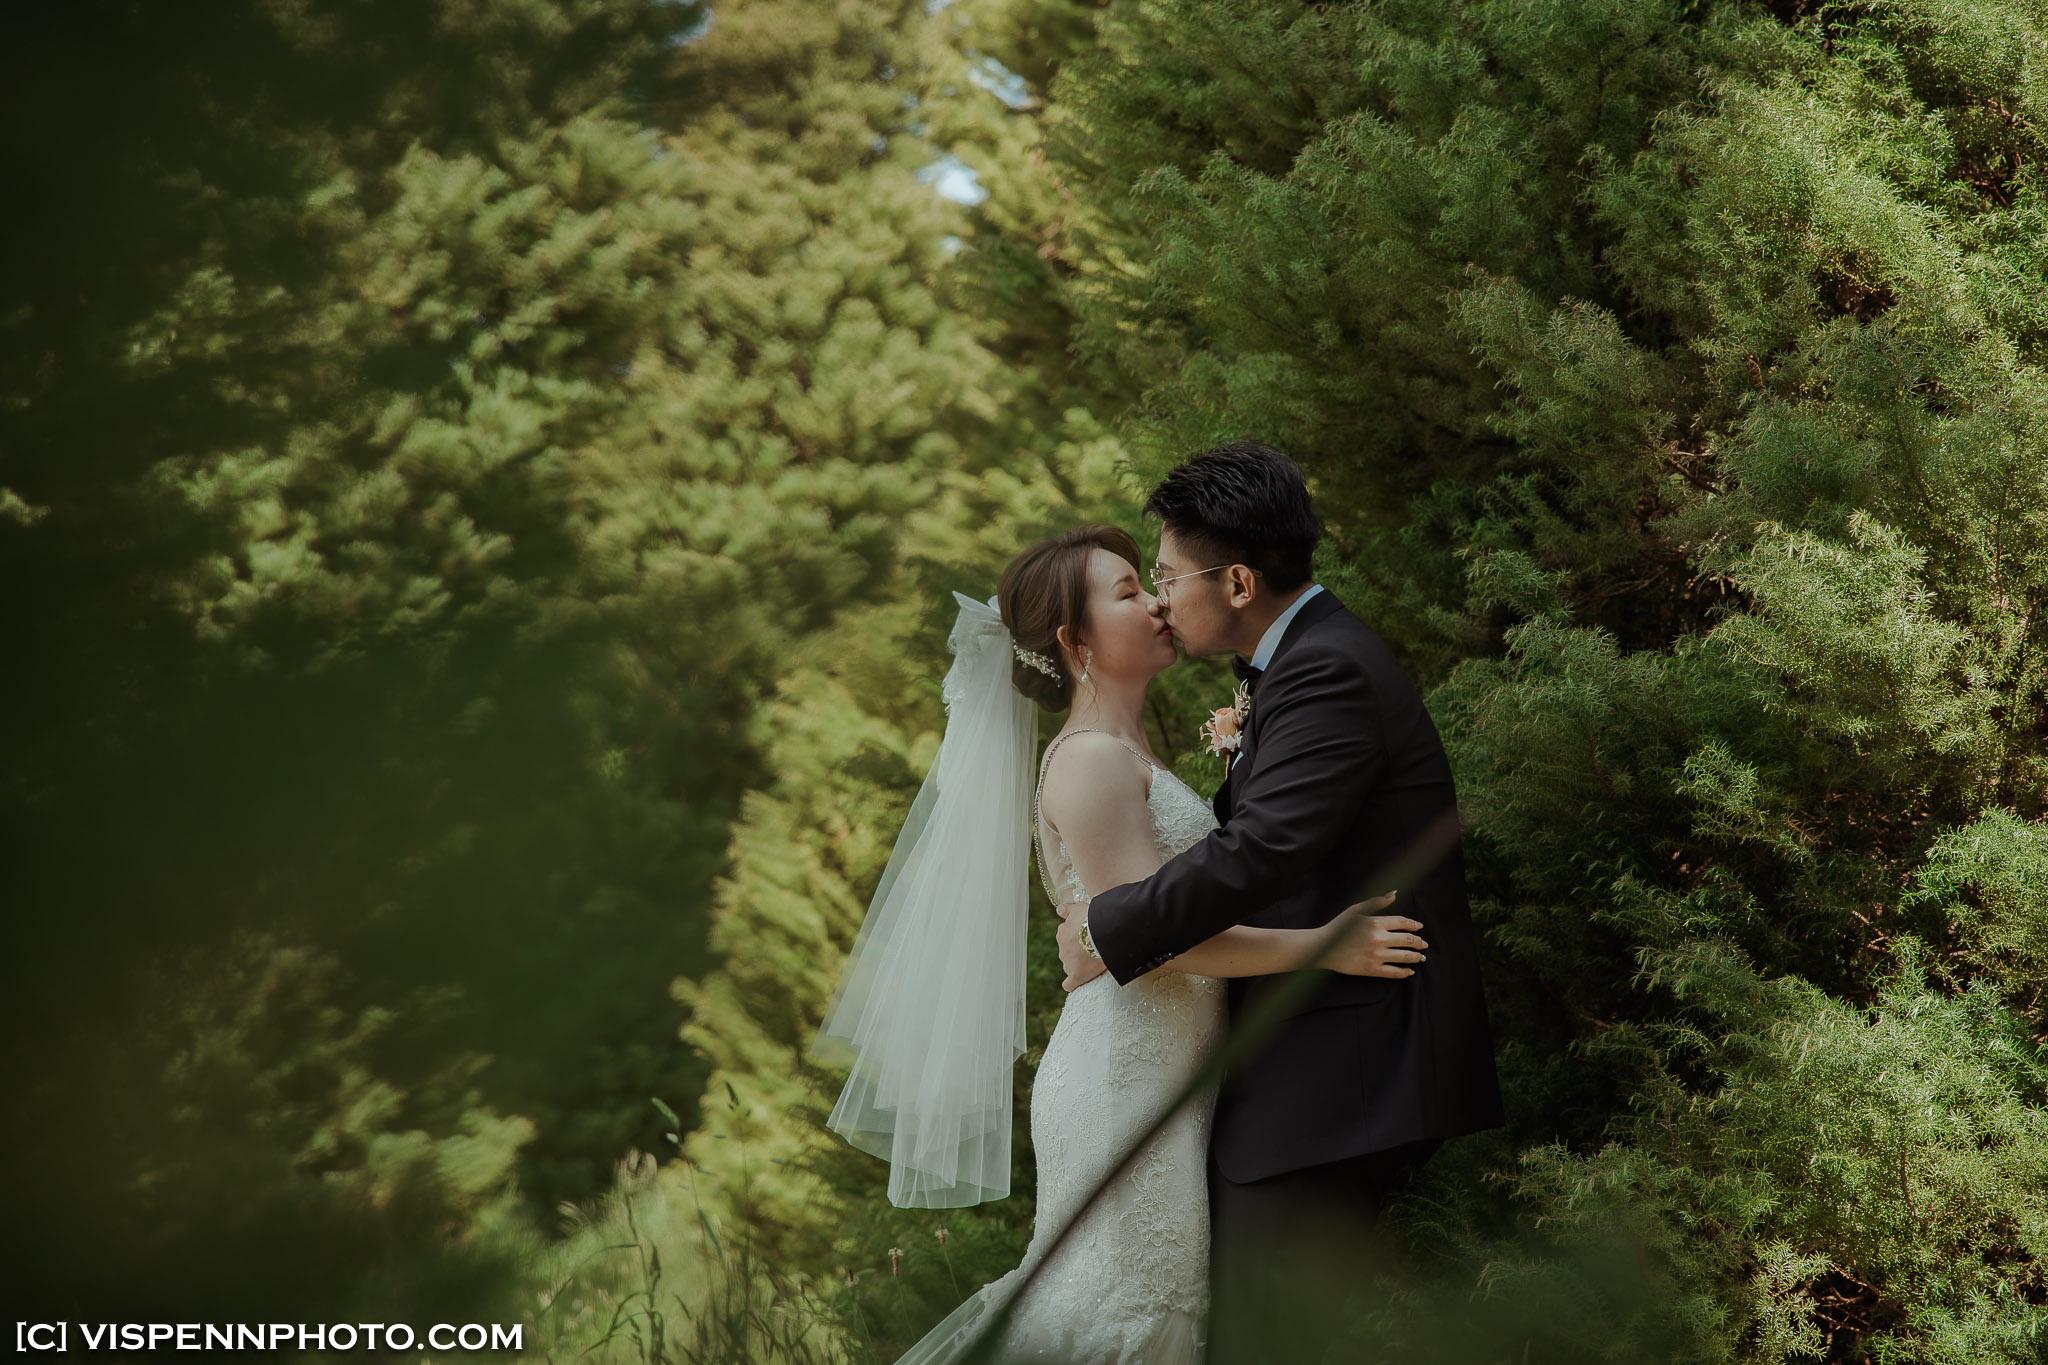 WEDDING DAY Photography Melbourne VISPENN 墨尔本 婚礼跟拍 婚礼摄像 婚礼摄影 结婚照 登记照 ElitaPB 06385 1P EOSR VISPENN